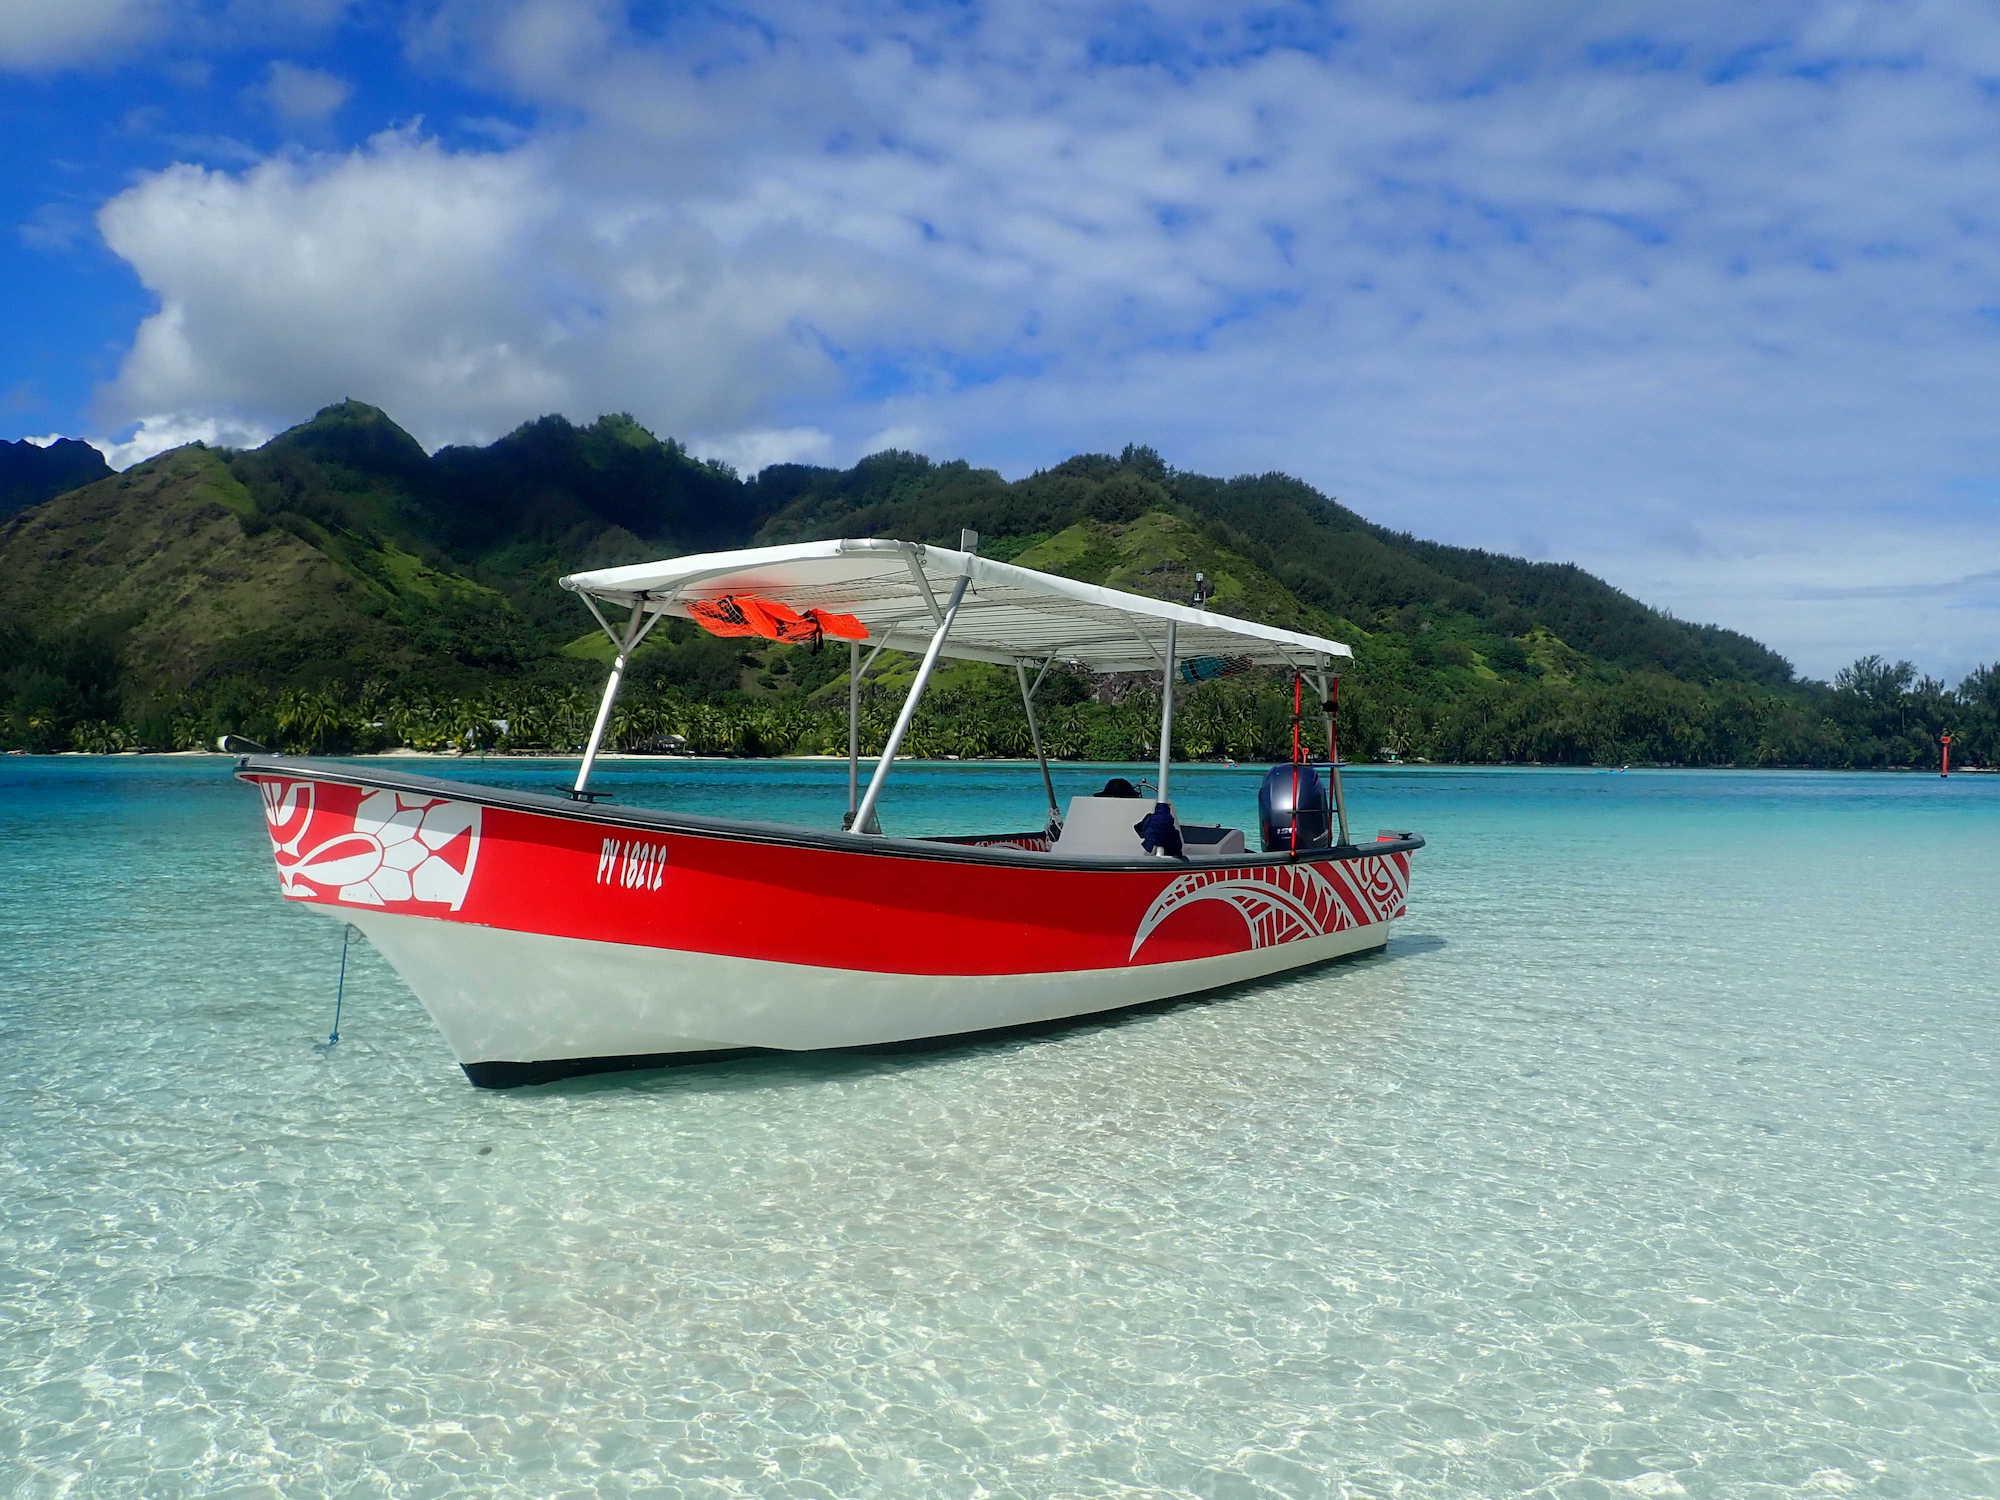 https://tahititourisme.fr/wp-content/uploads/2020/09/Boat-Hinaloa.jpg